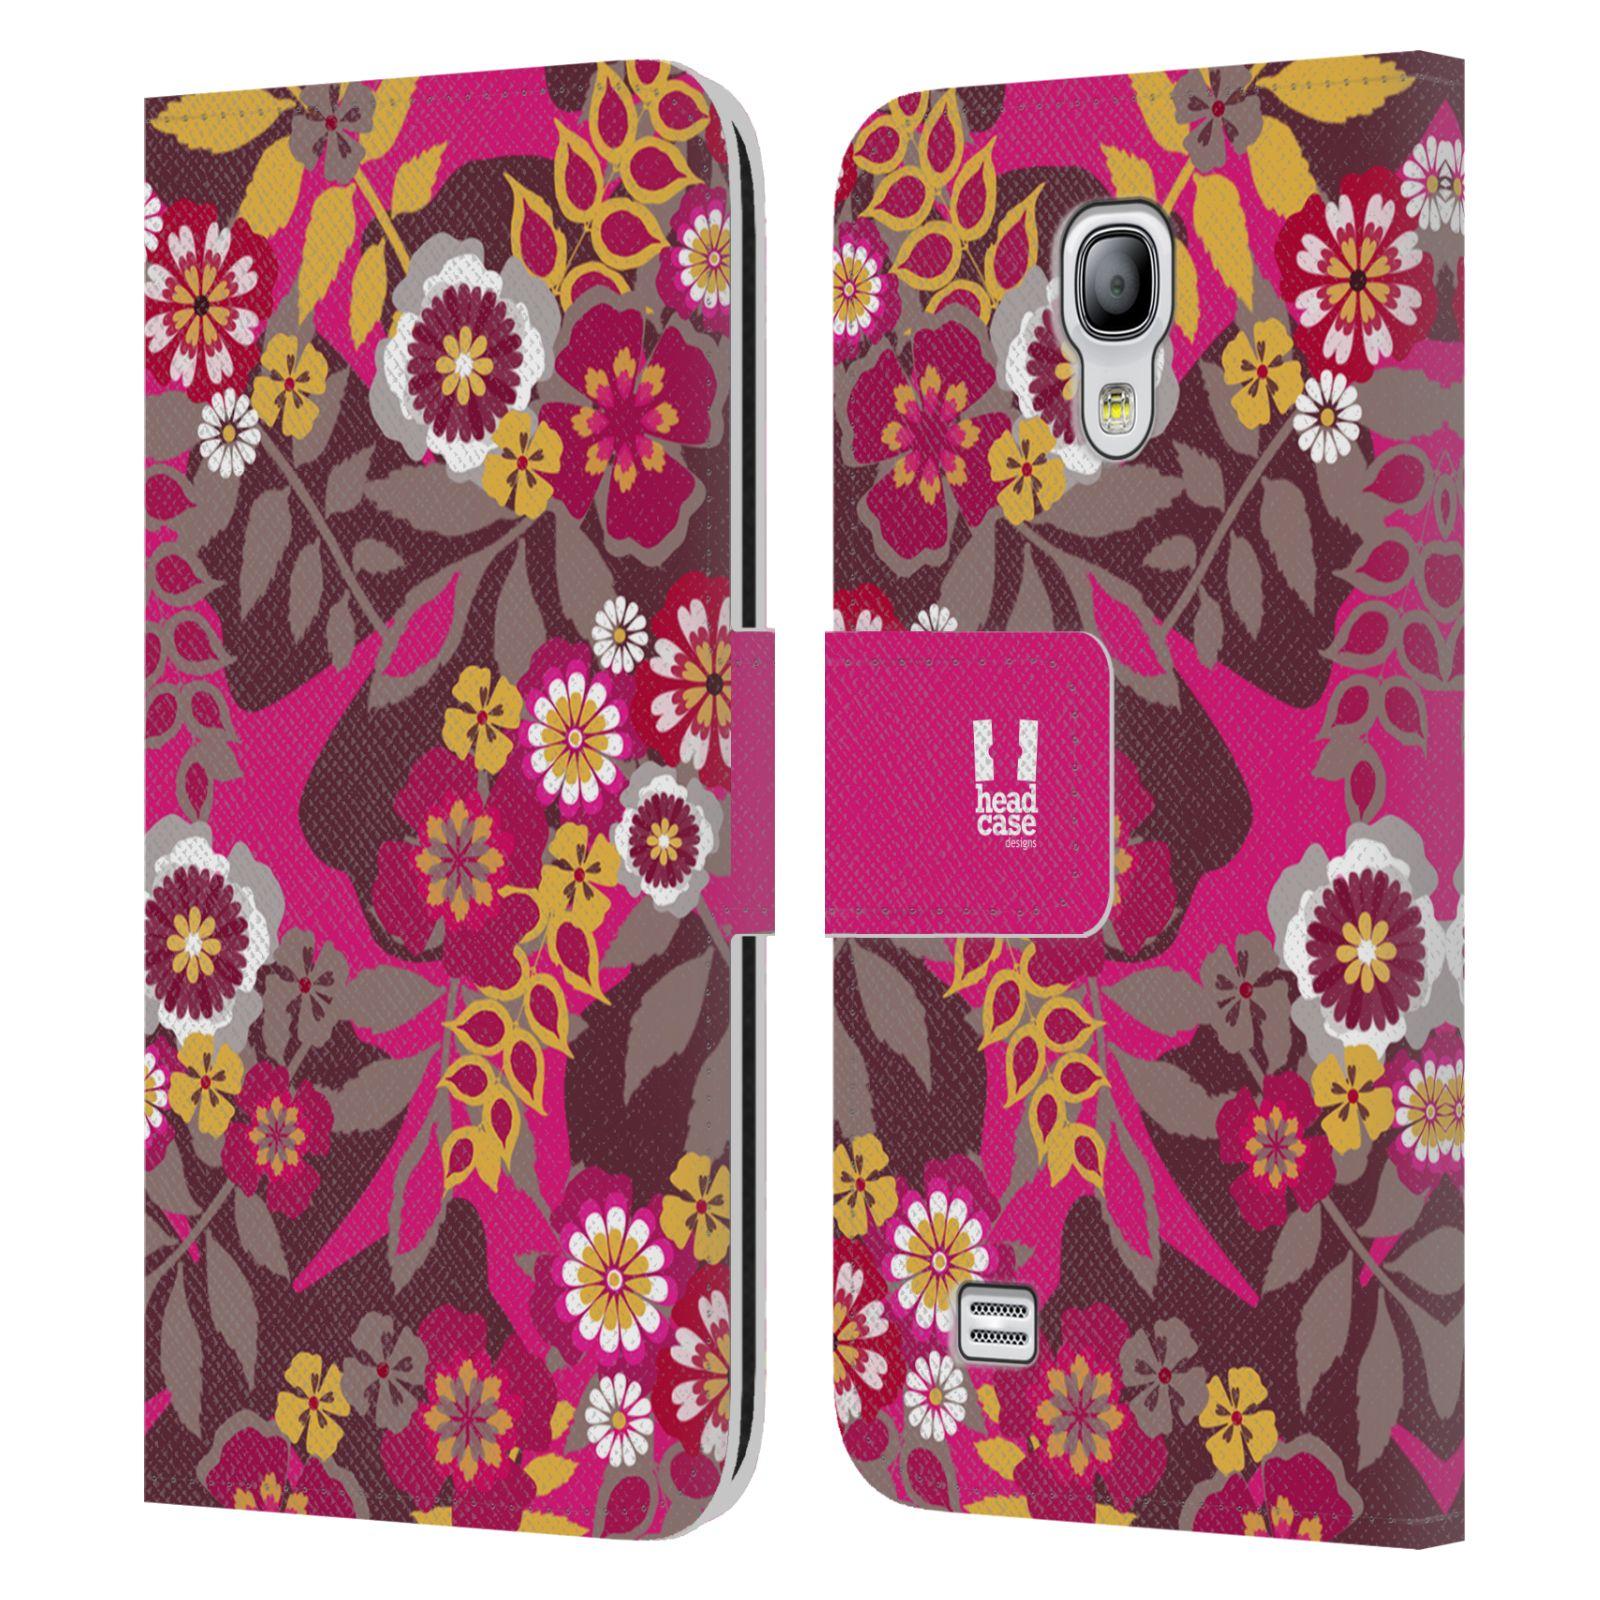 HEAD CASE Flipové pouzdro pro mobil Samsung Galaxy S4 MINI / S4 MINI DUOS BOTANIKA růžová a hnědá